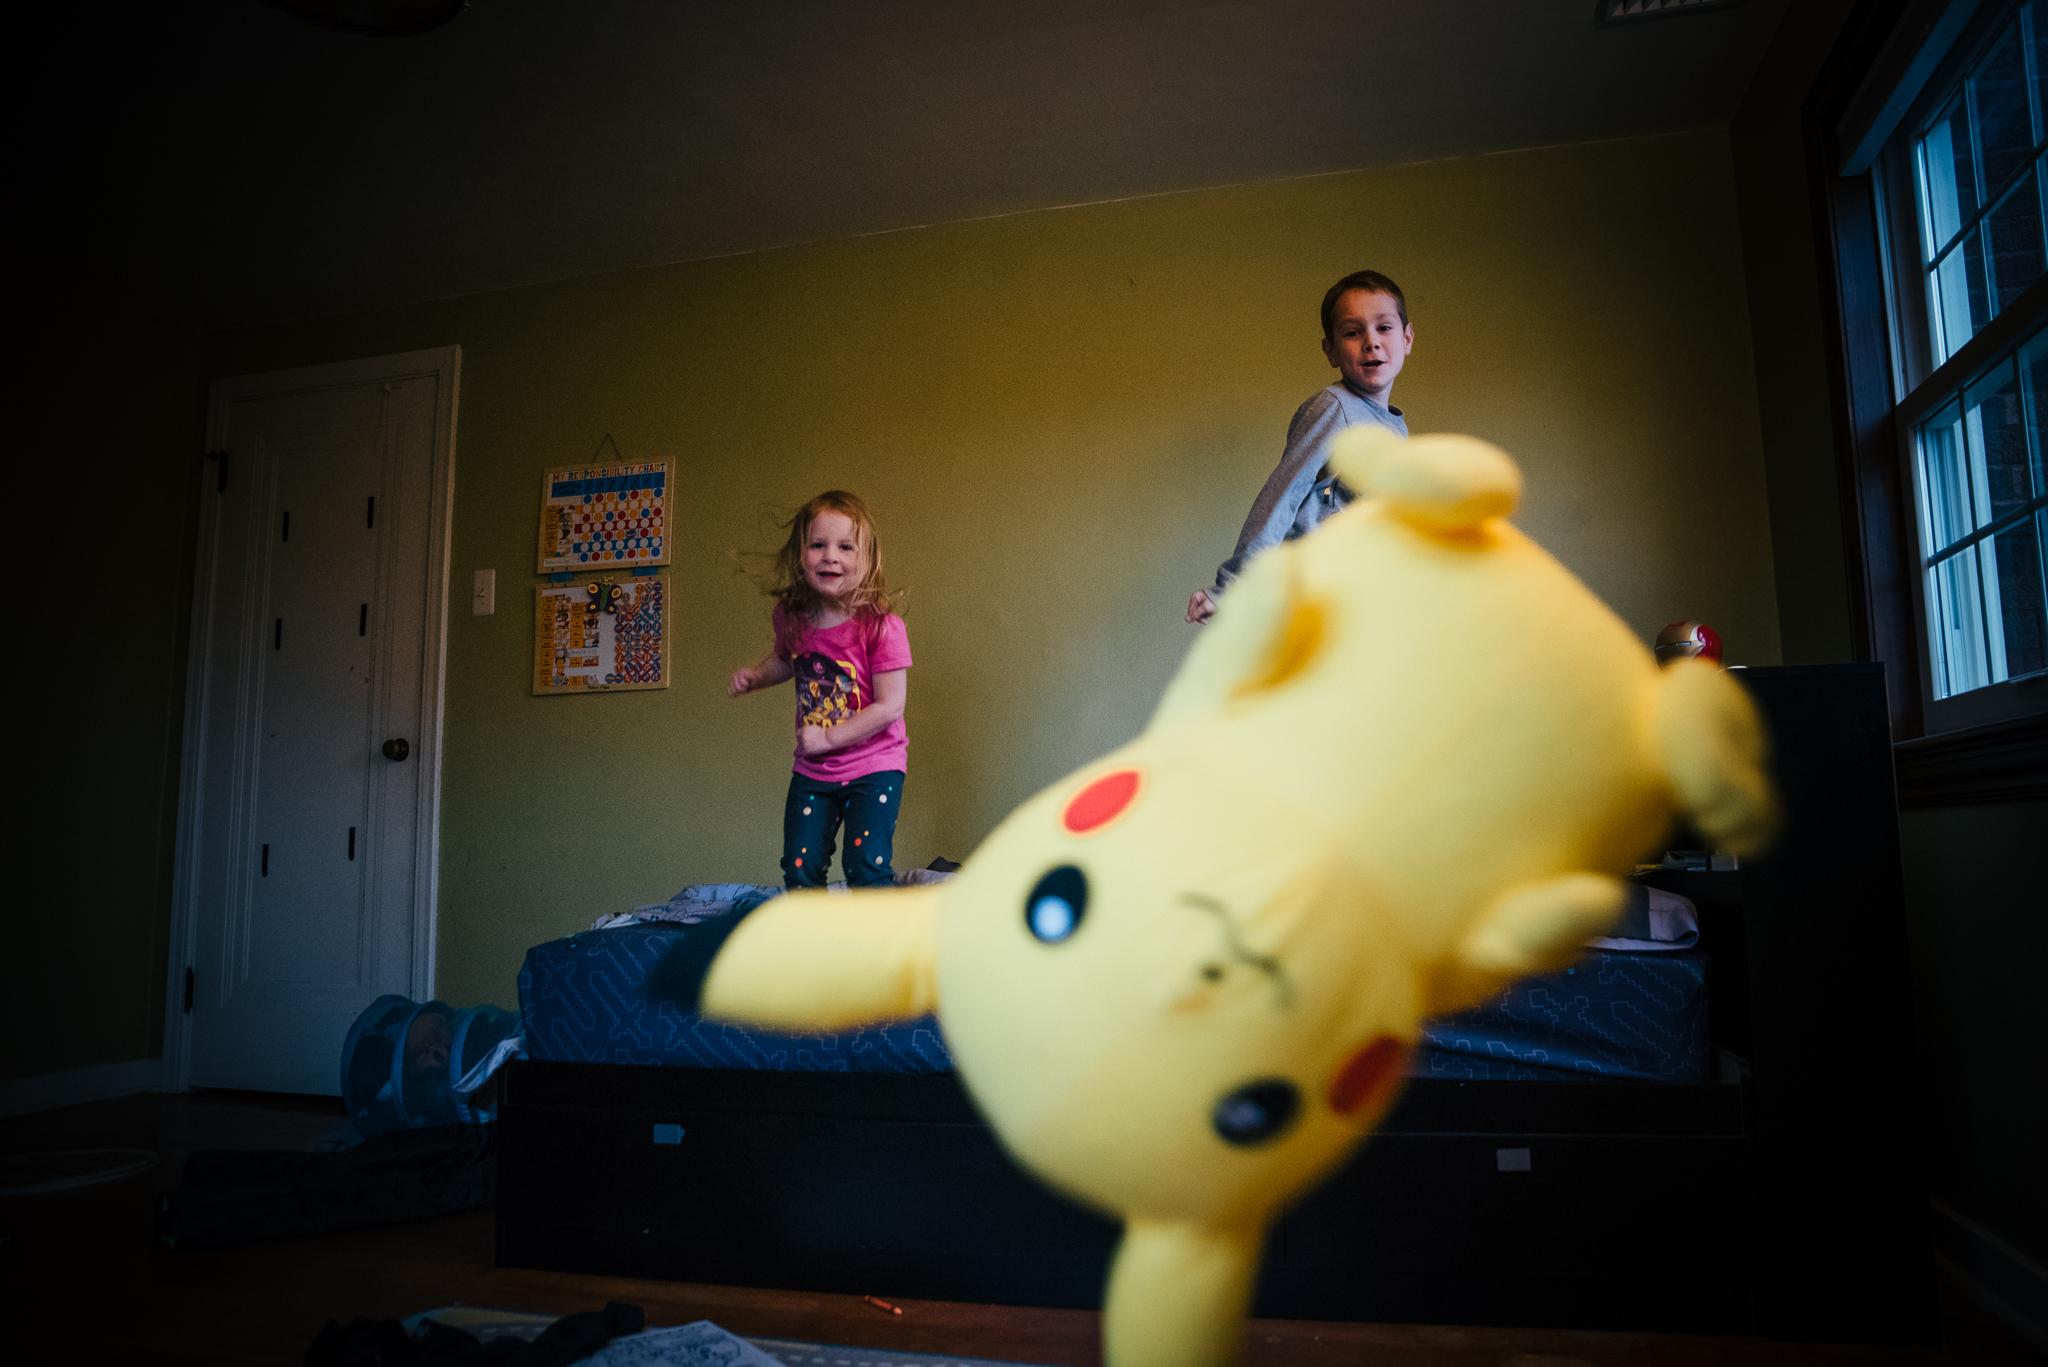 Pikachu in the air